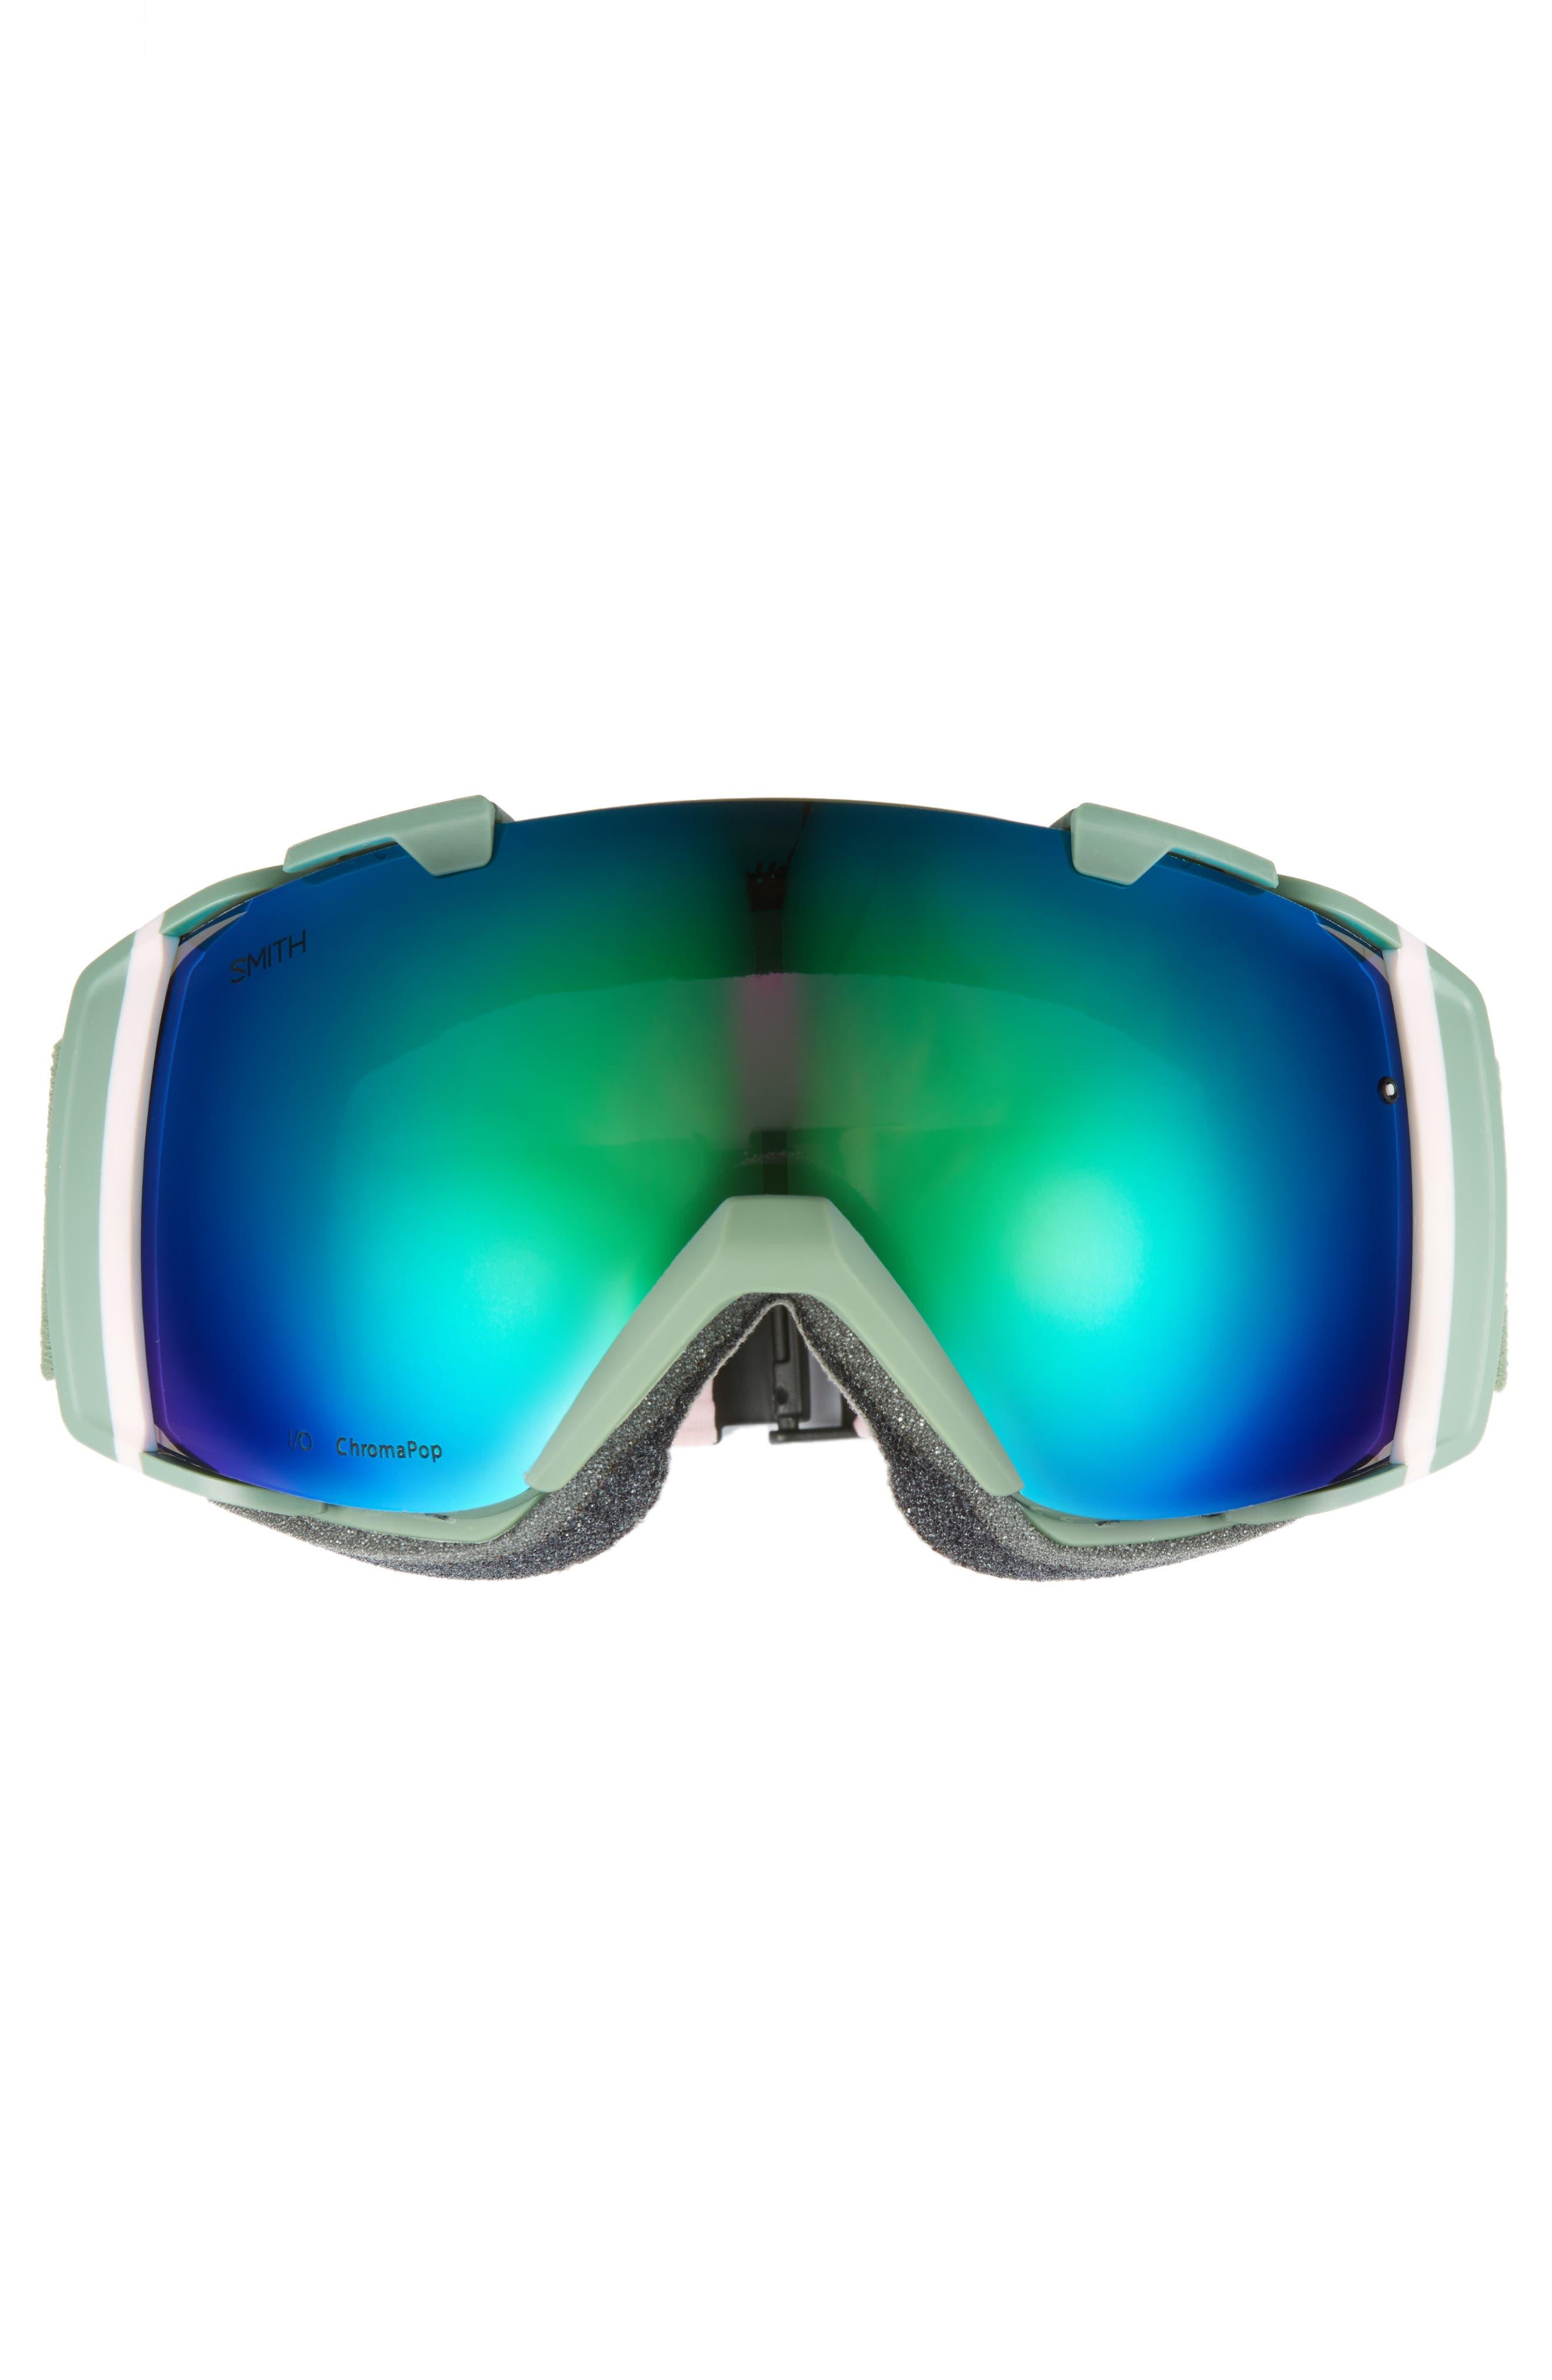 I/O 180mm Snow/Ski Goggles,                             Alternate thumbnail 3, color,                             Patina Split/ Mirror